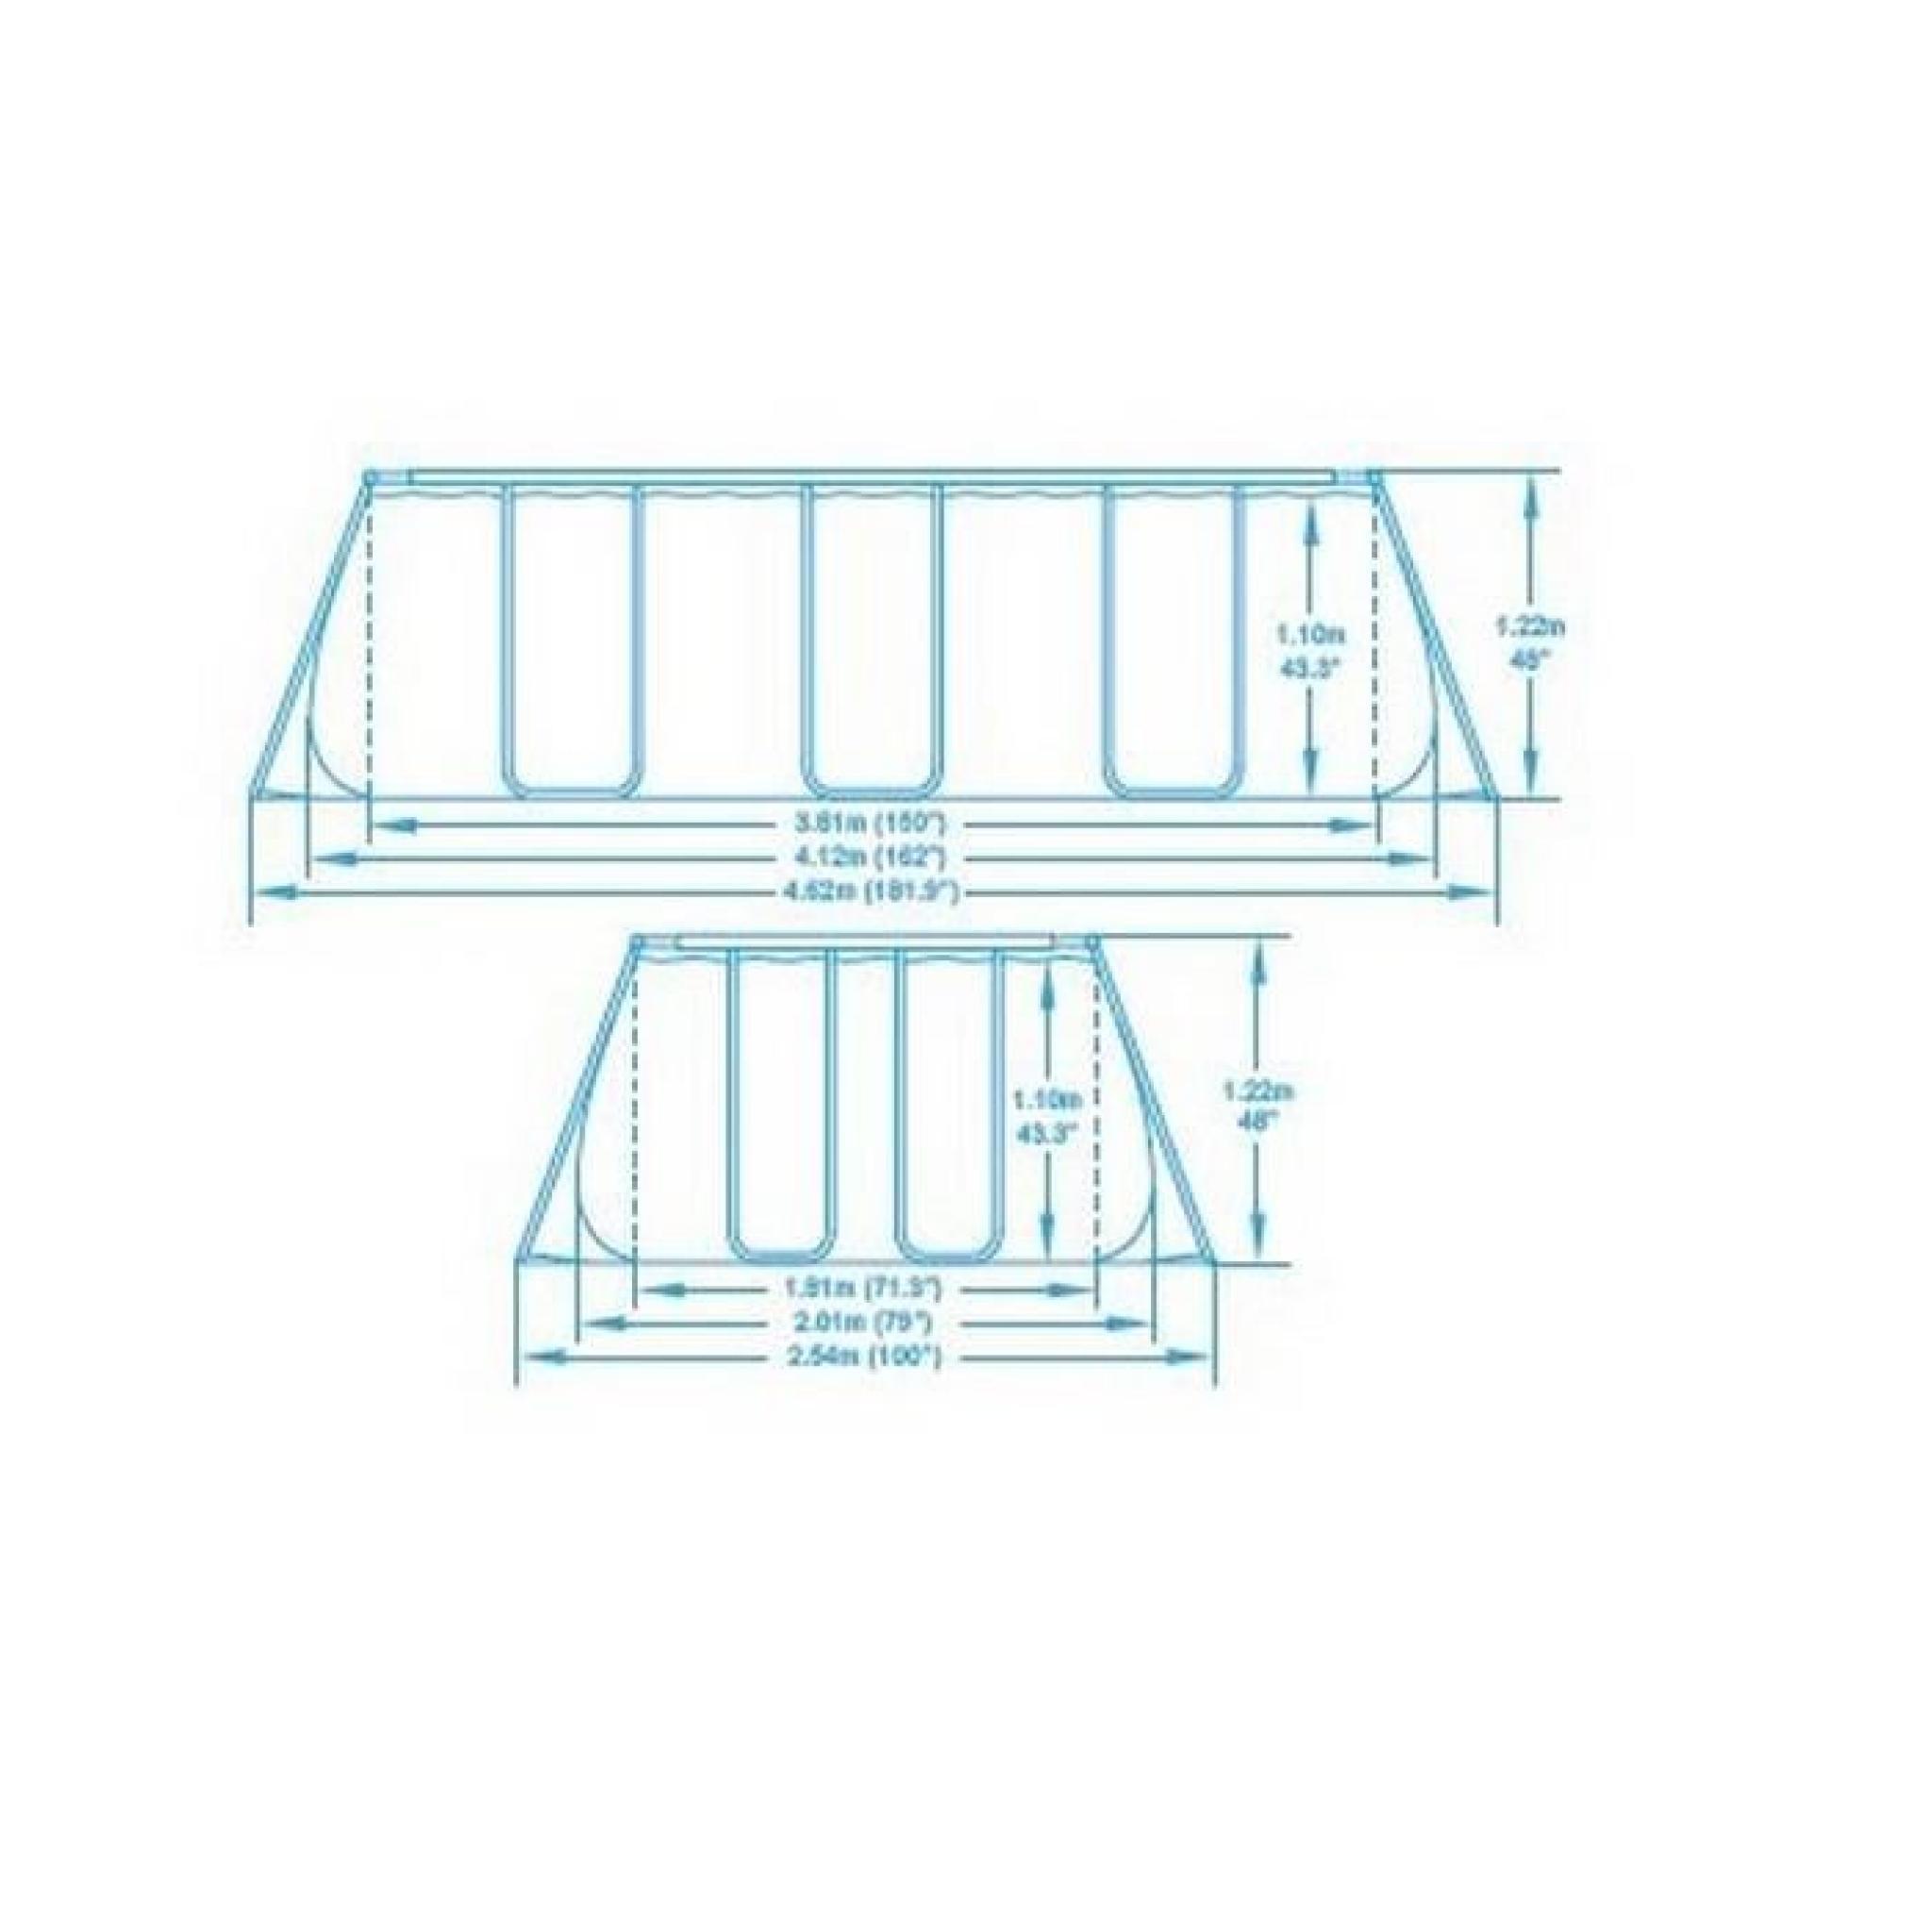 Bestway piscine tubulaire rectangulaire filtration cartouche achat vente for Piscine tubulaire rectangulaire pas chere